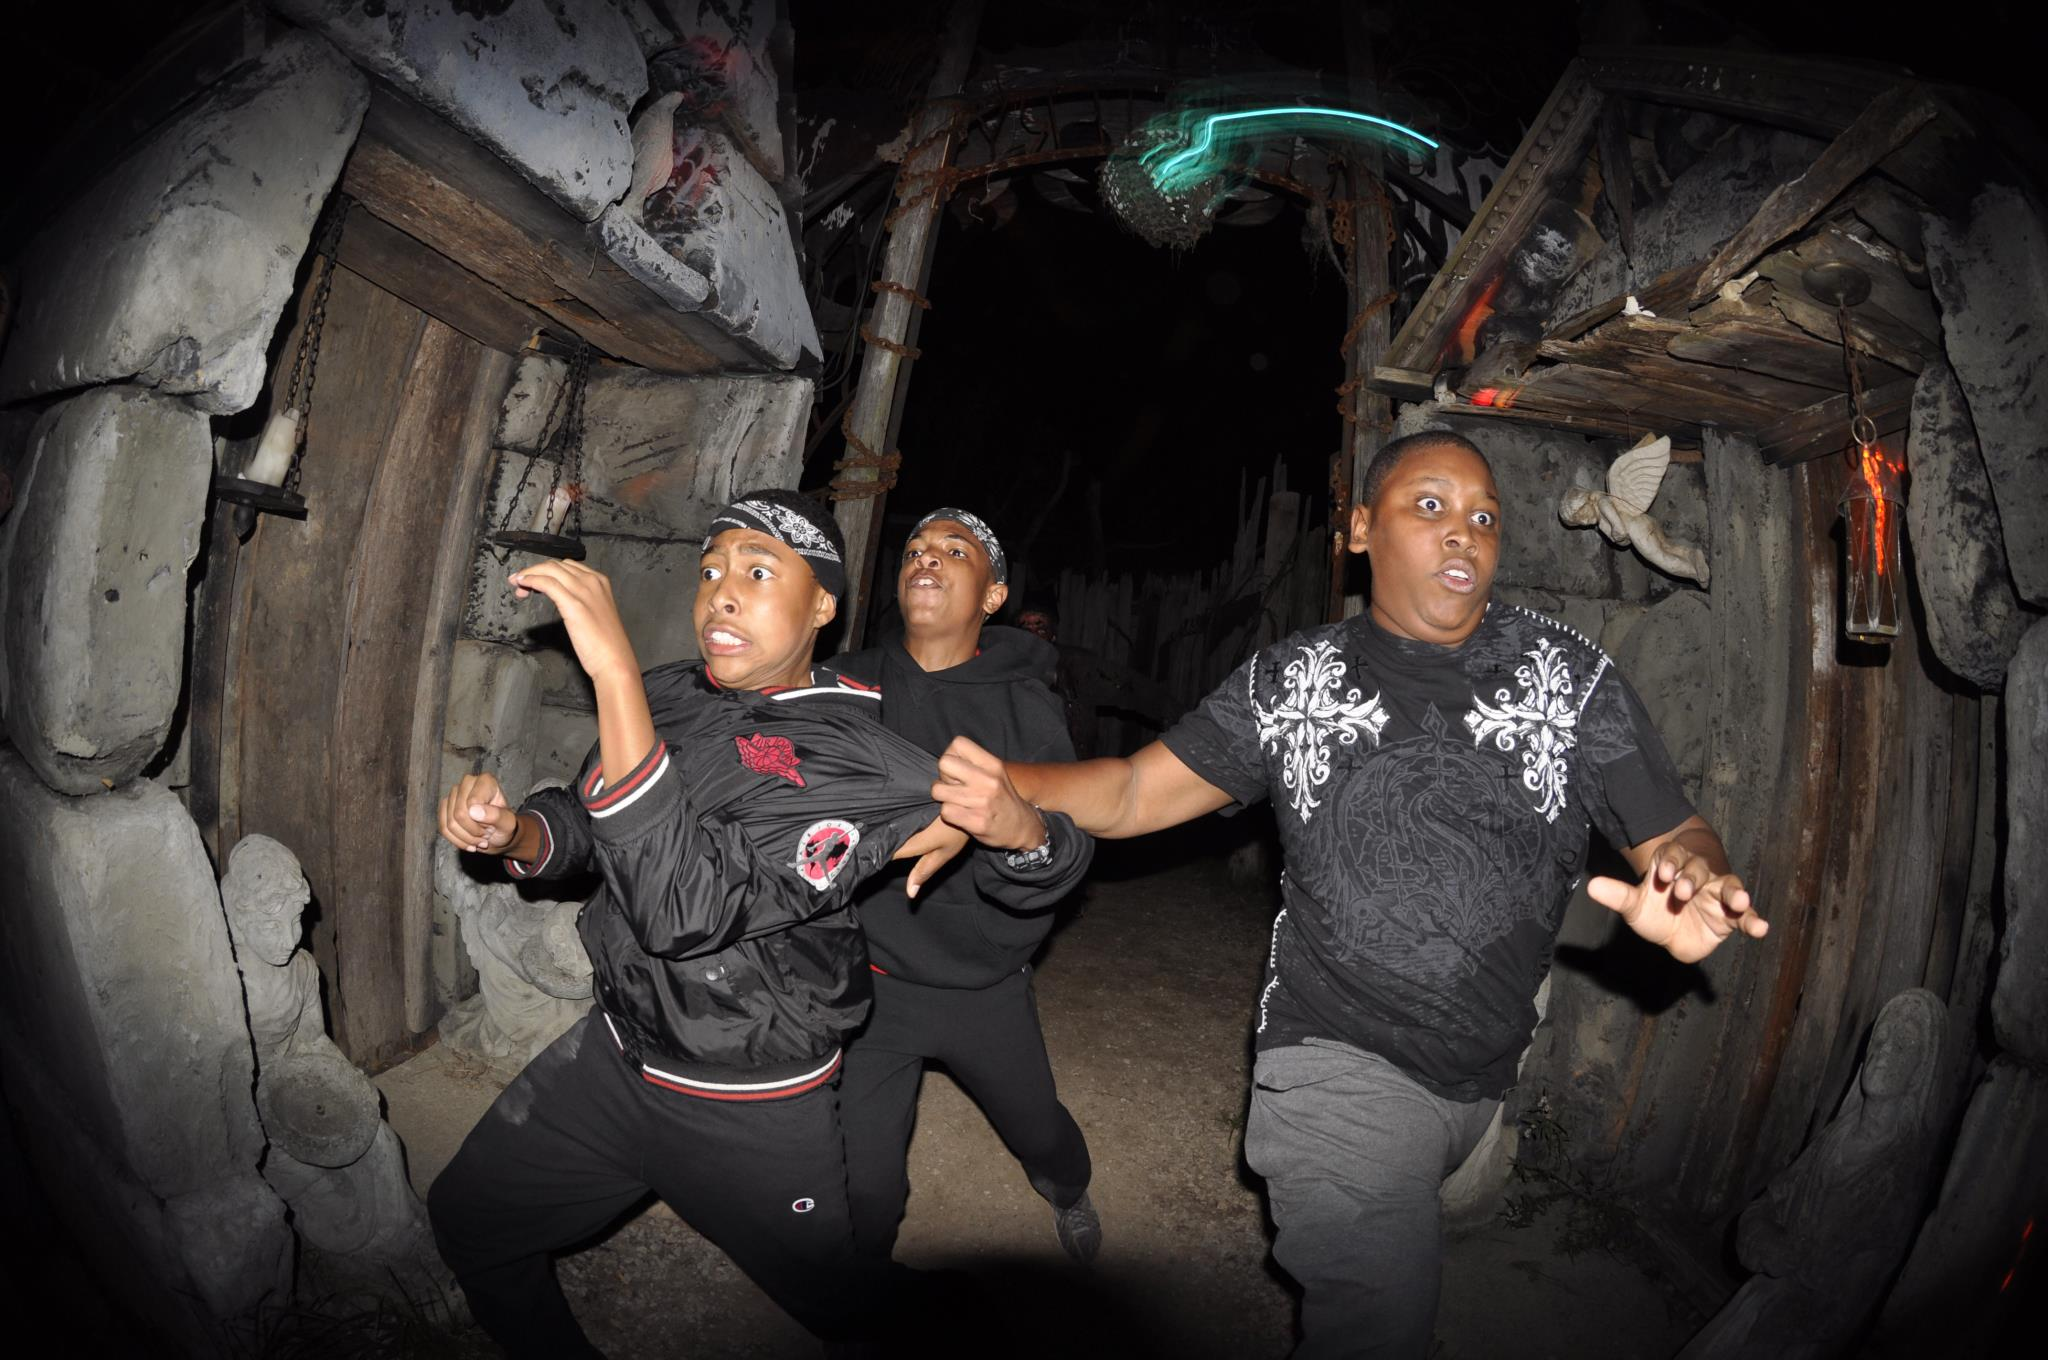 I love haunted house action shots.